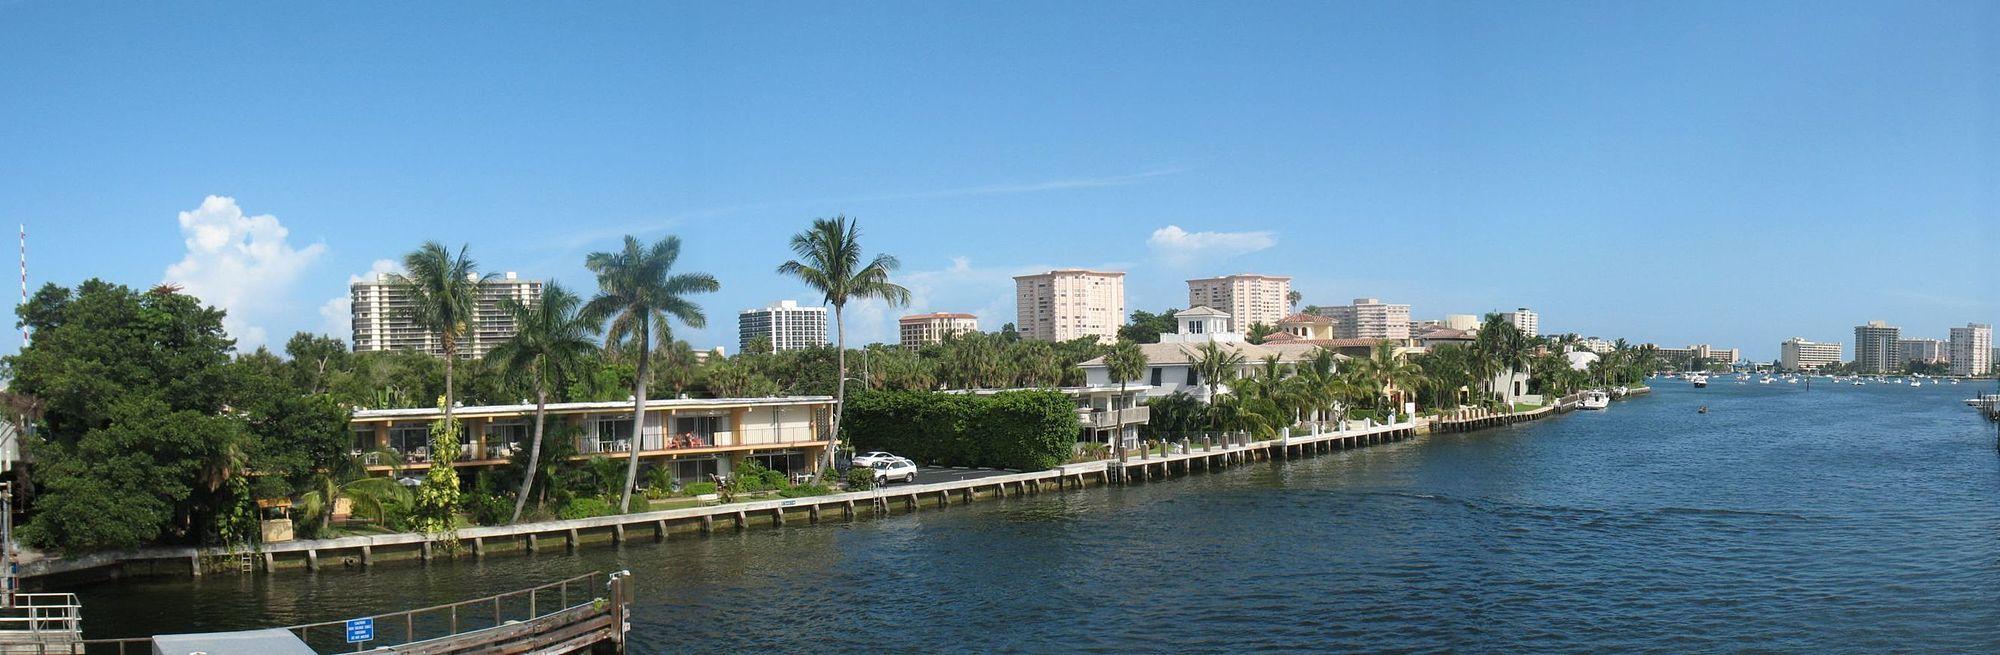 couples retreat florida Boca Raton